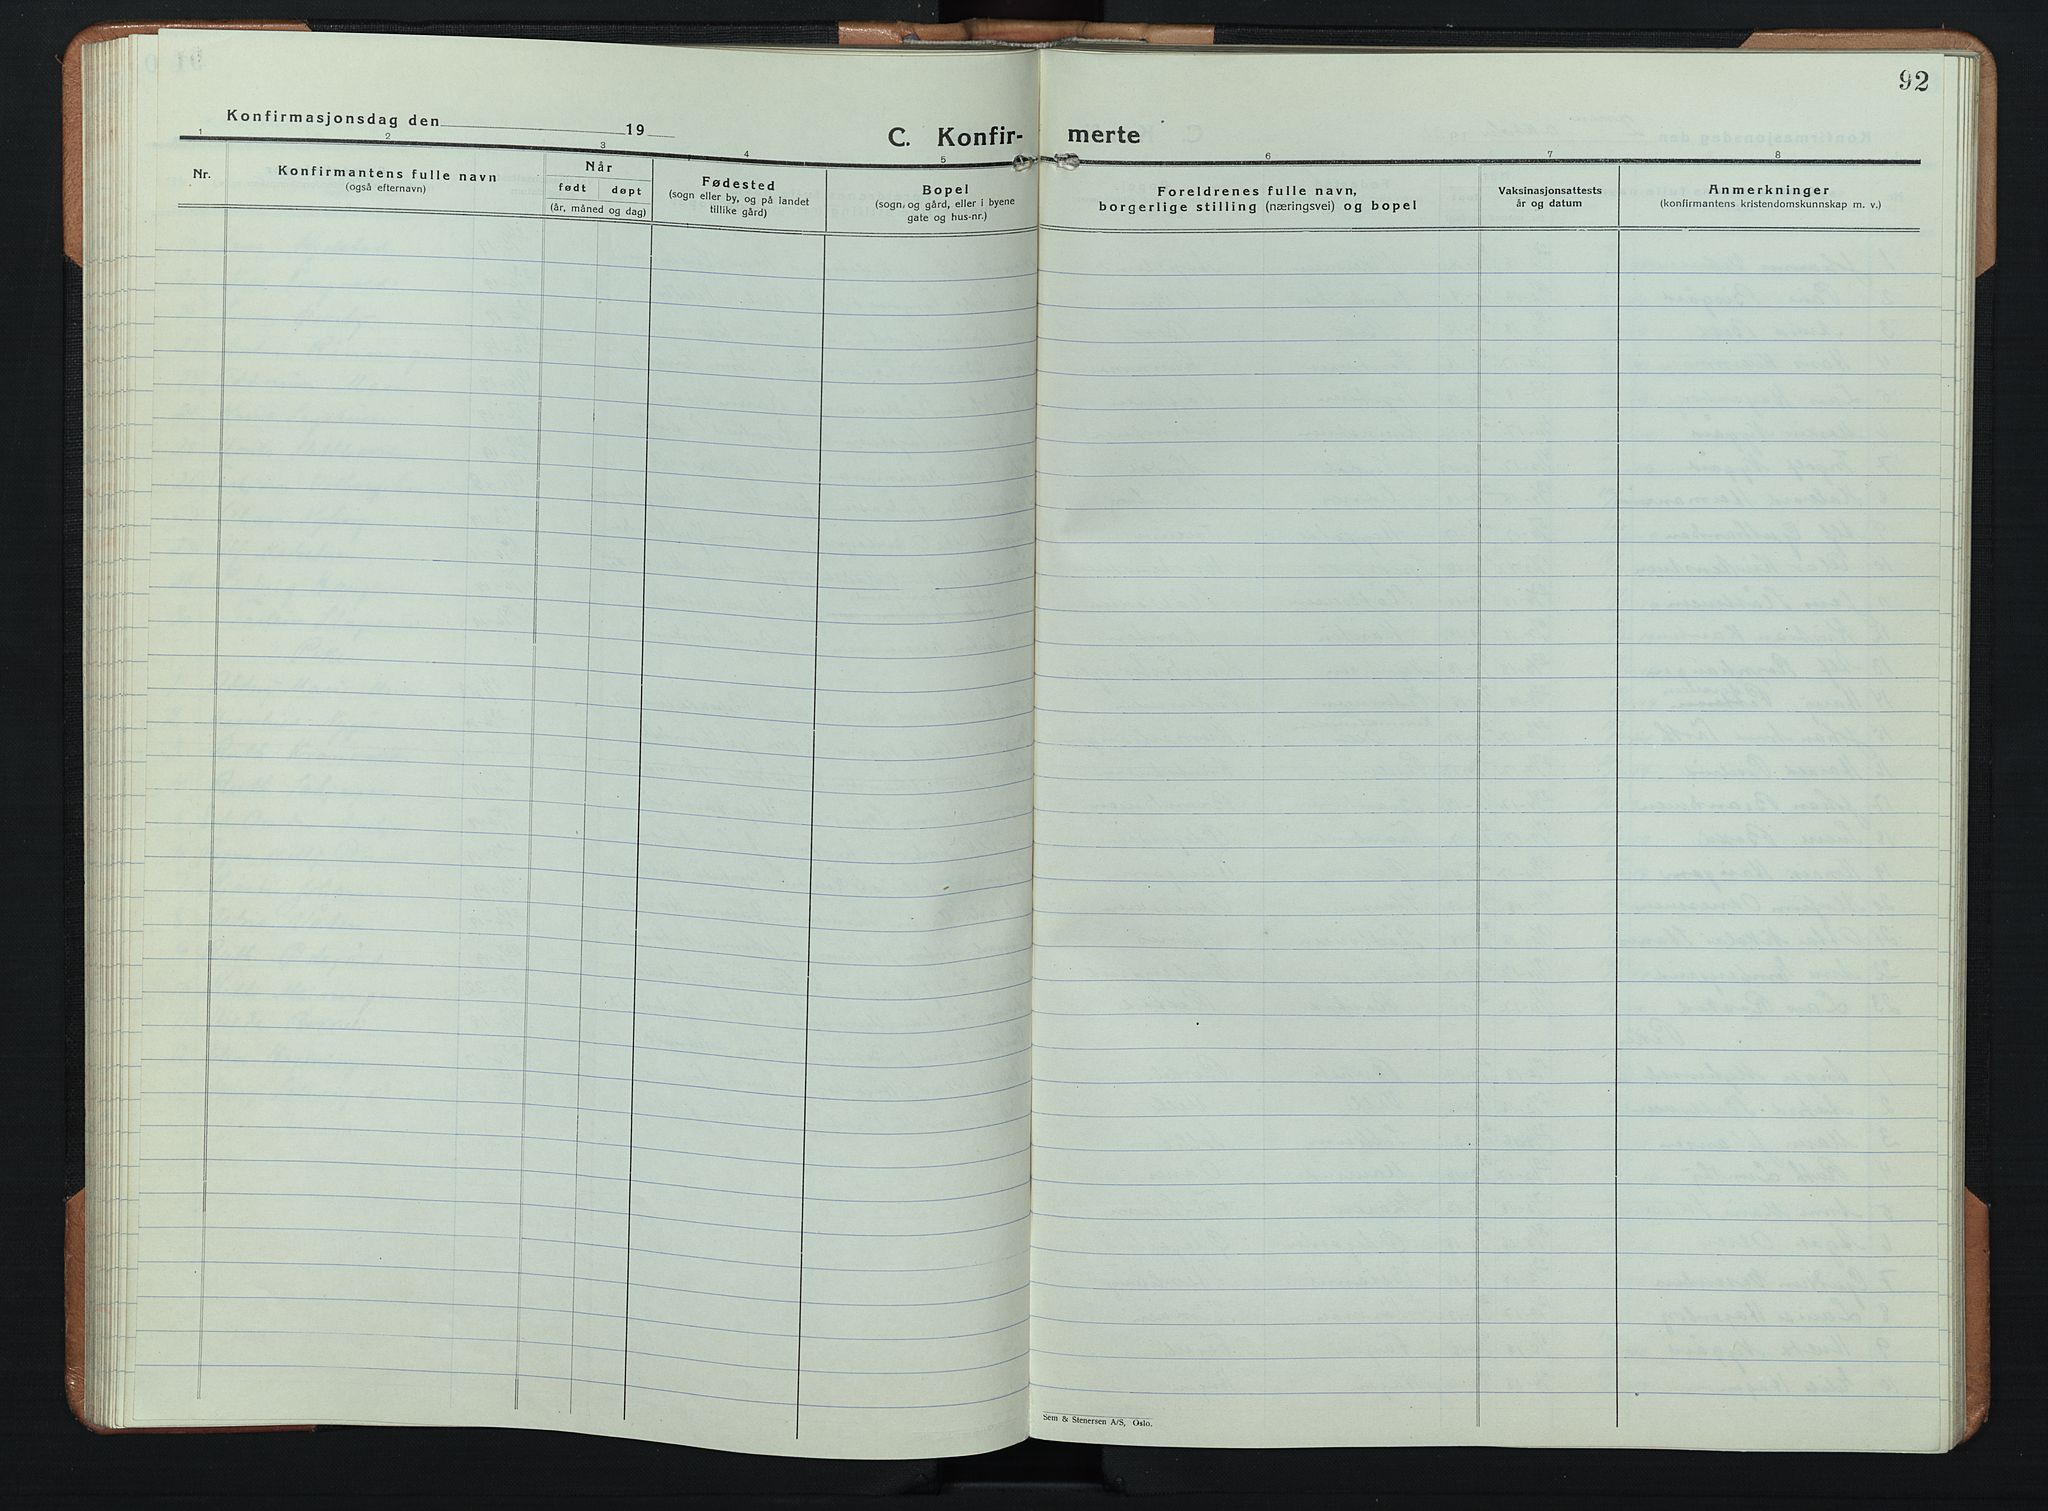 SAH, Søndre Land prestekontor, L/L0008: Klokkerbok nr. 8, 1926-1950, s. 92